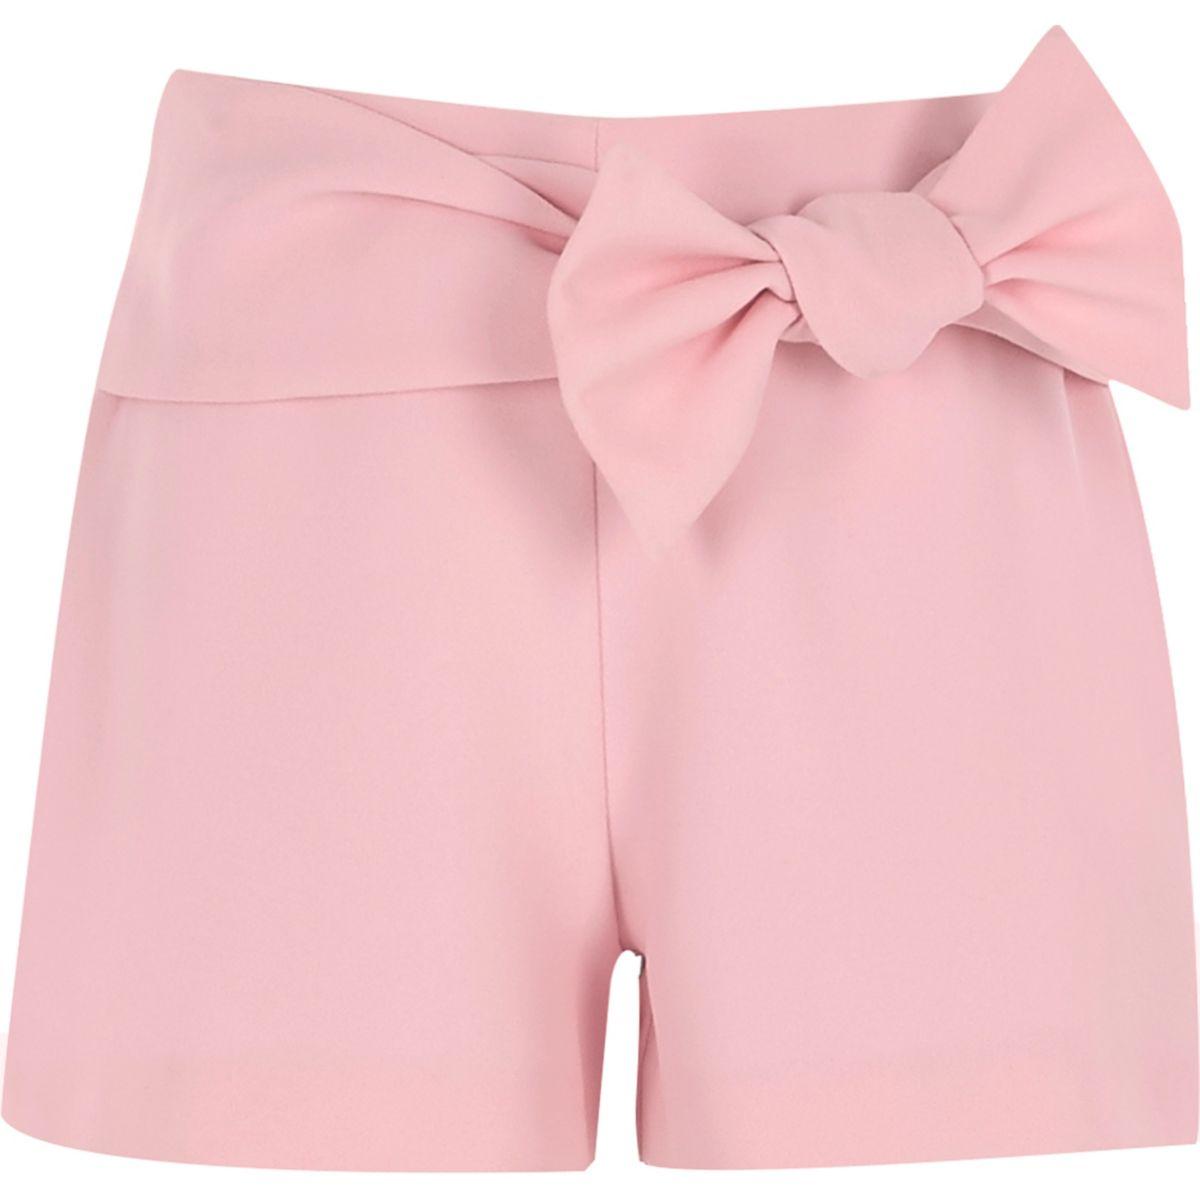 Pinke Shorts mit Schleife